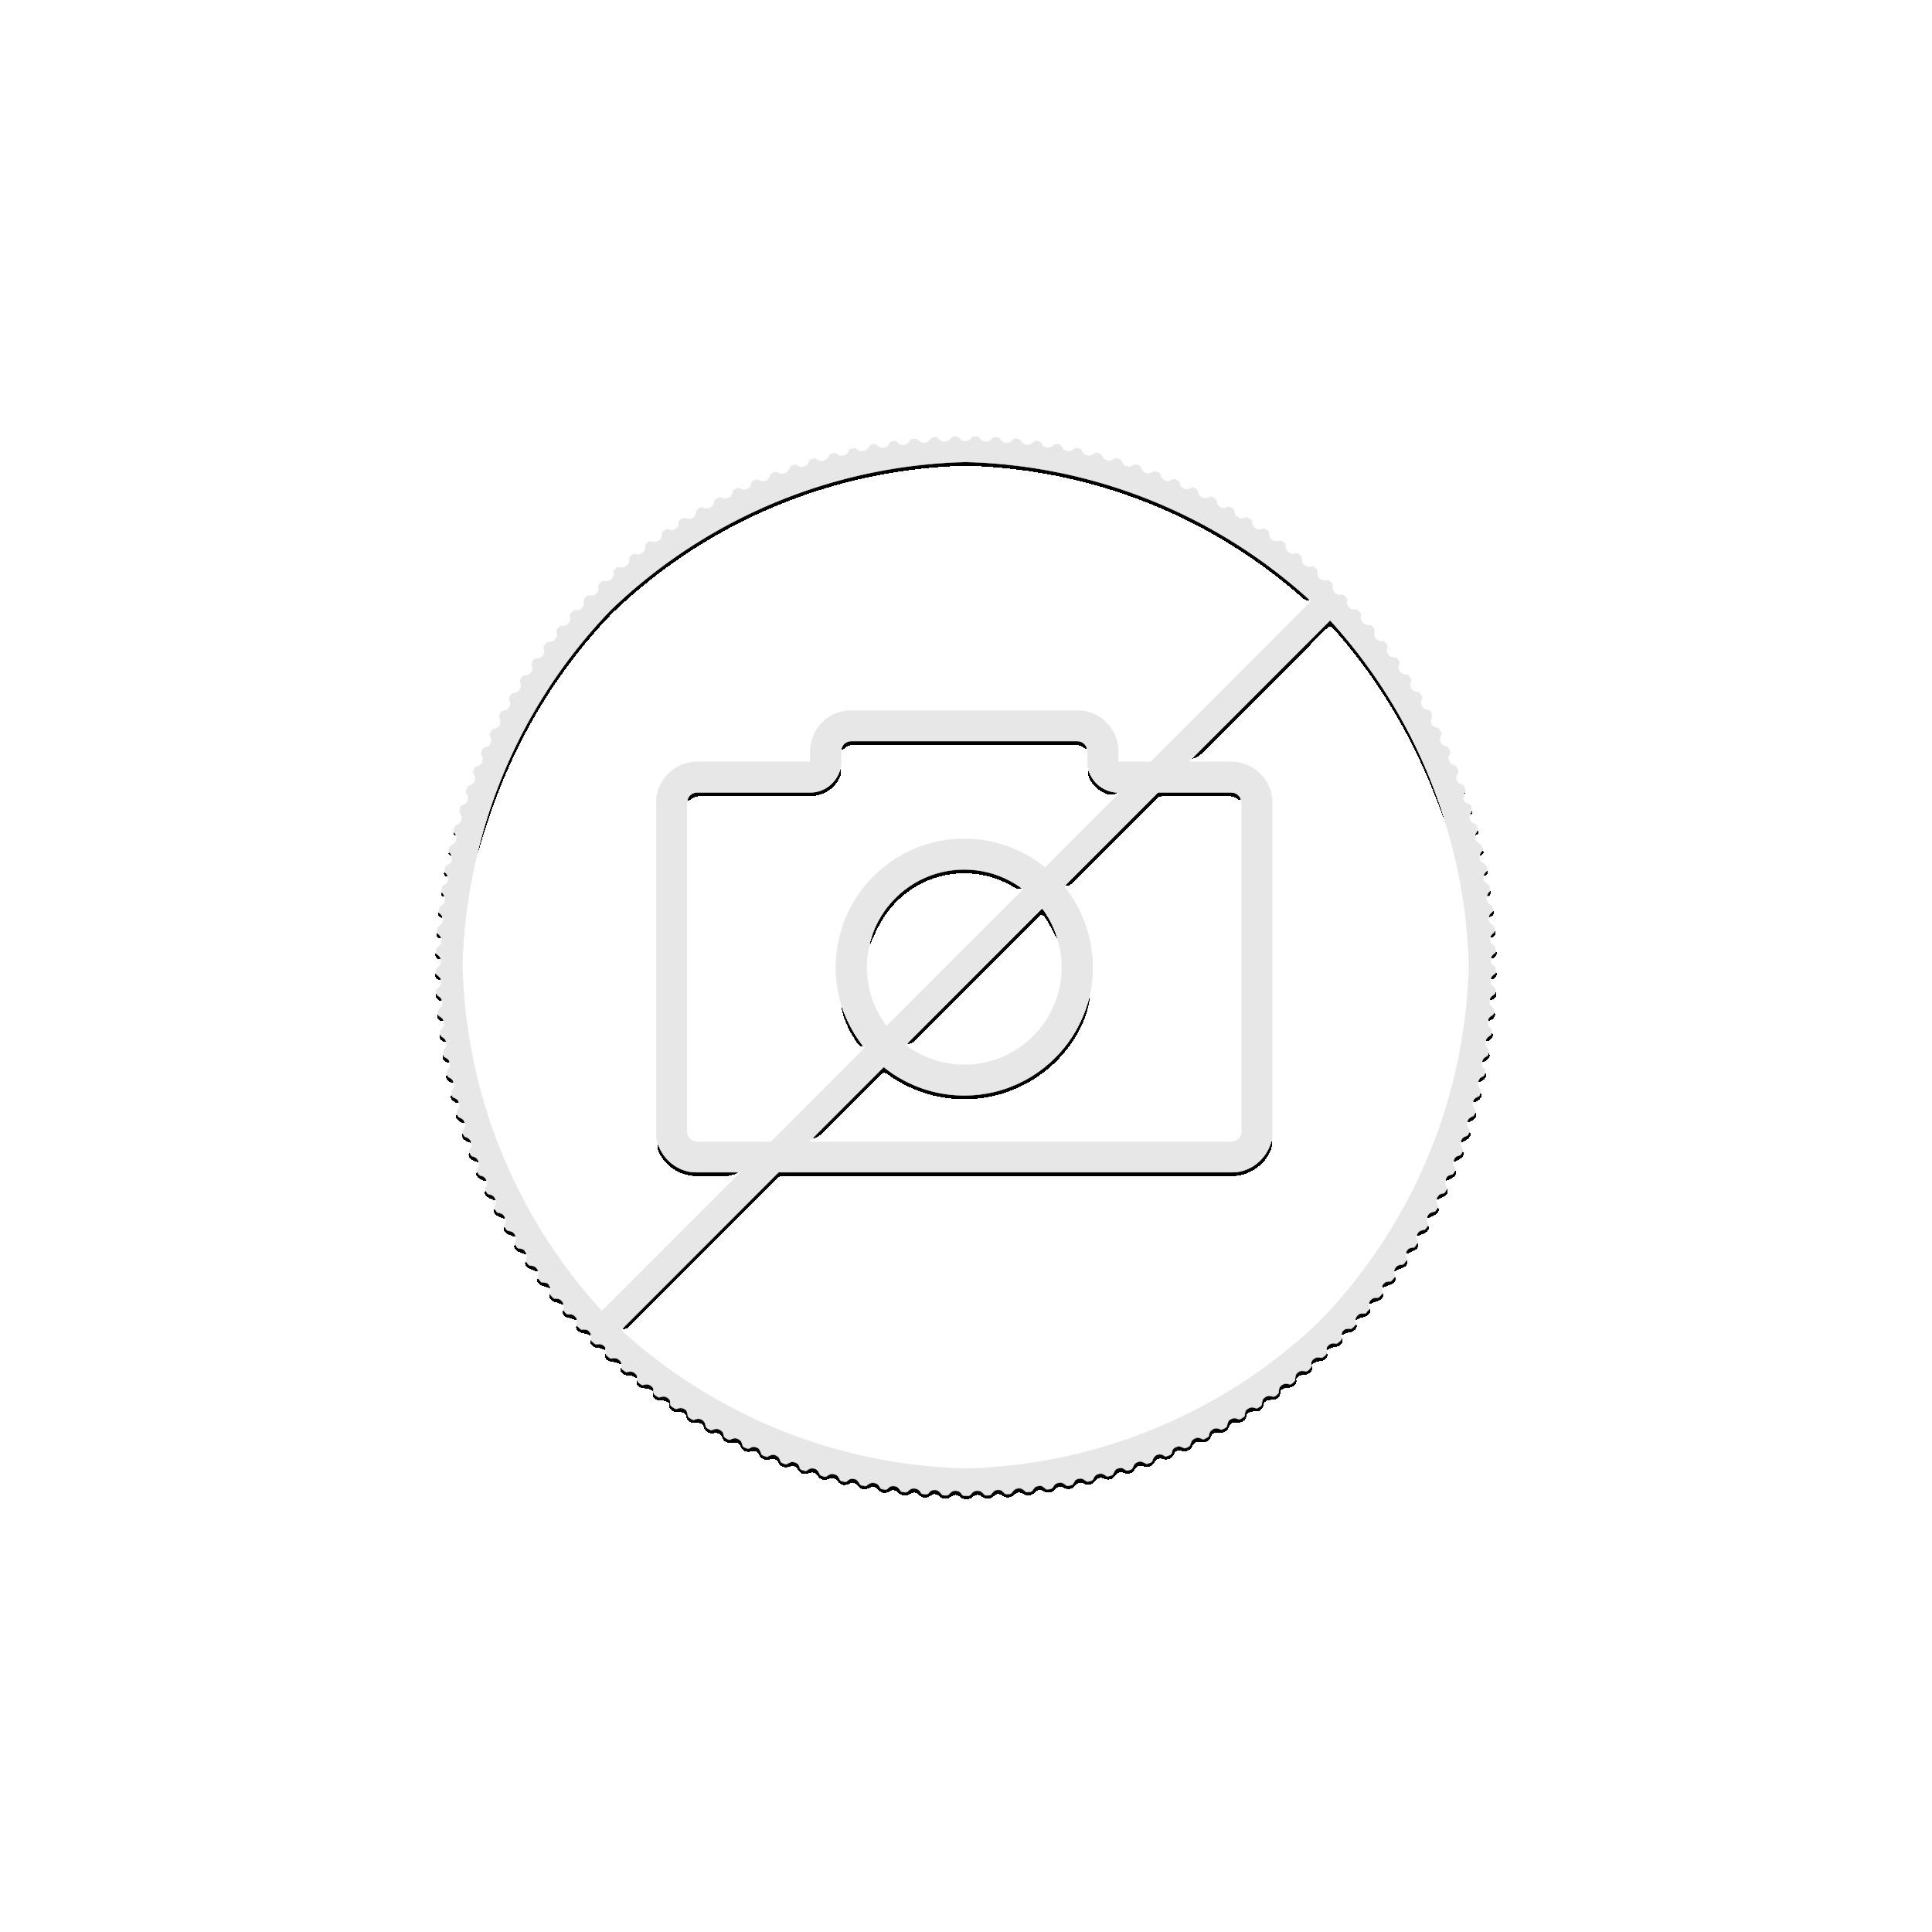 1 troy ounce silver Kangaroo coin